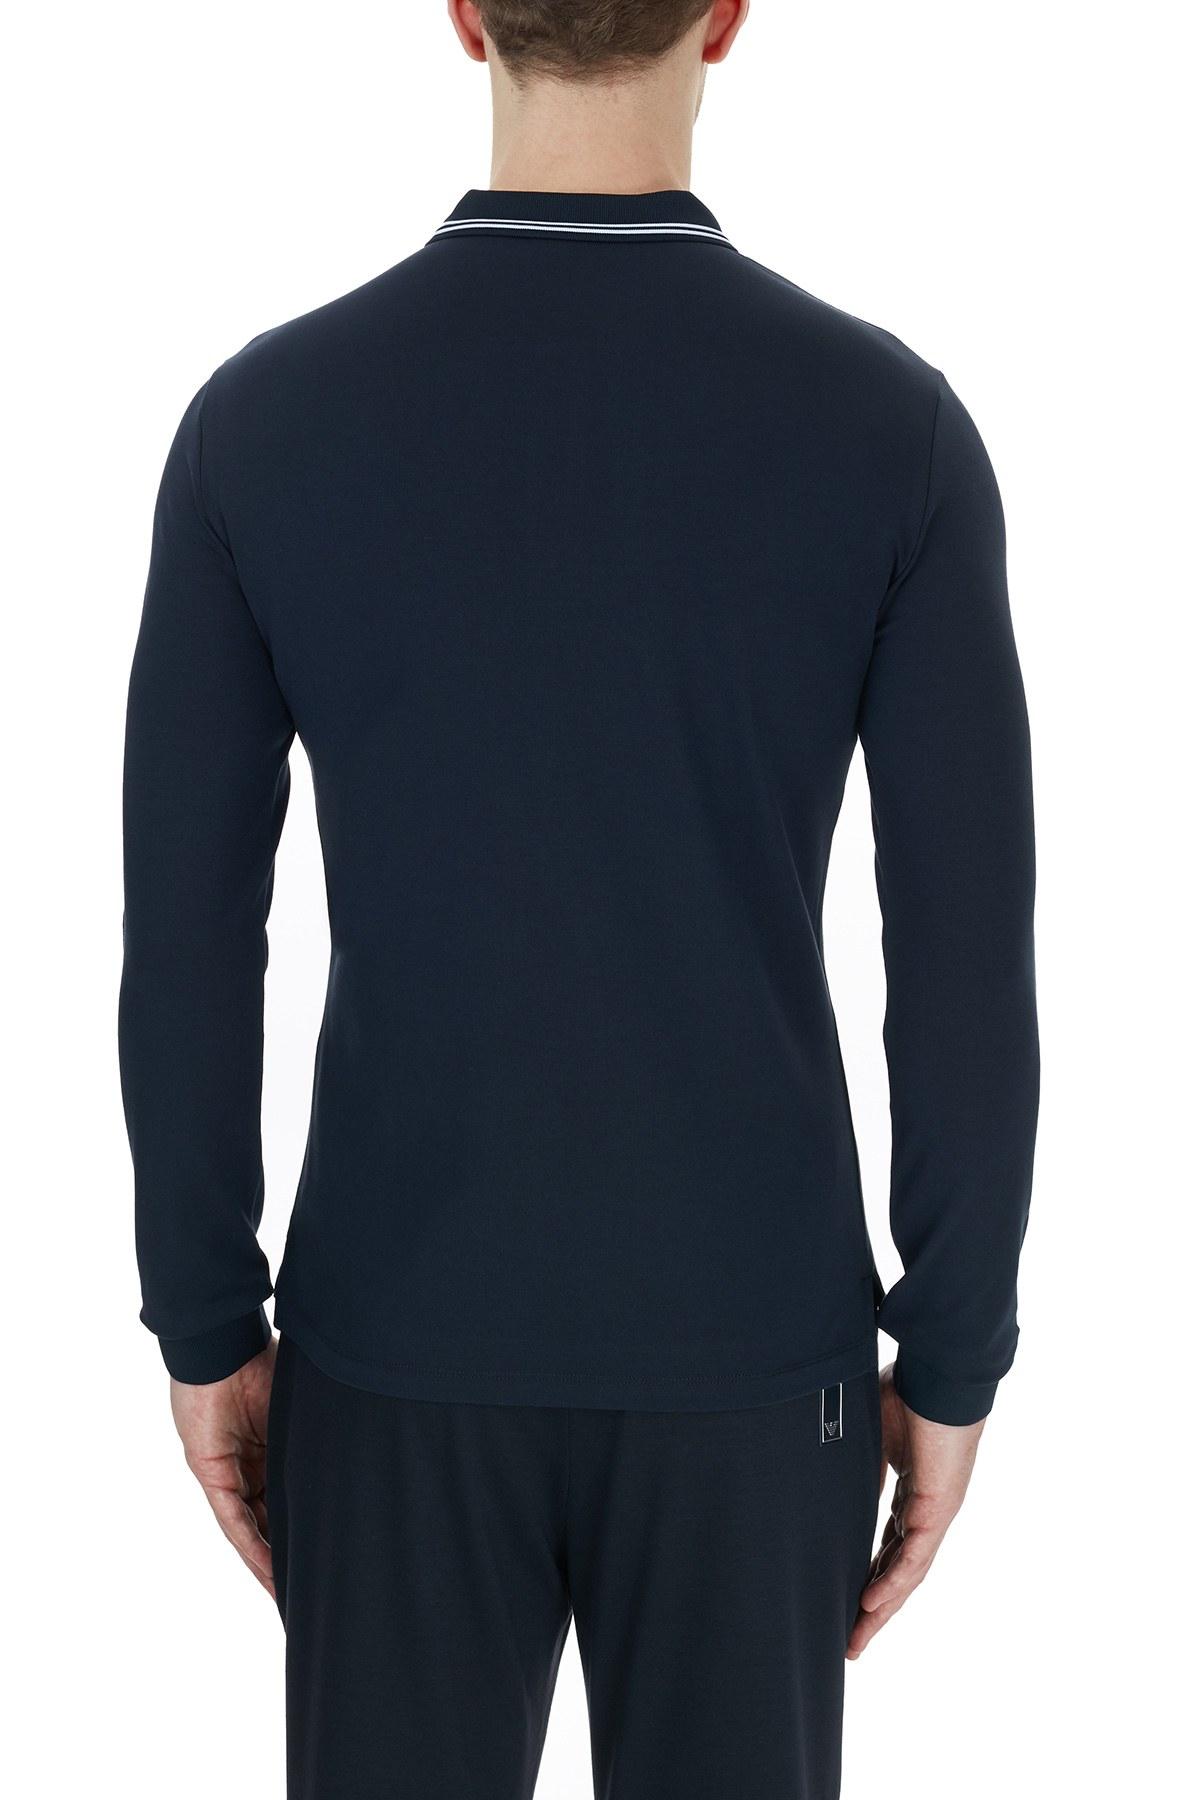 Emporio Armani Pamuklu Düğmeli T Shirt Erkek Polo 8N1F36 1JPTZ 0939 LACİVERT